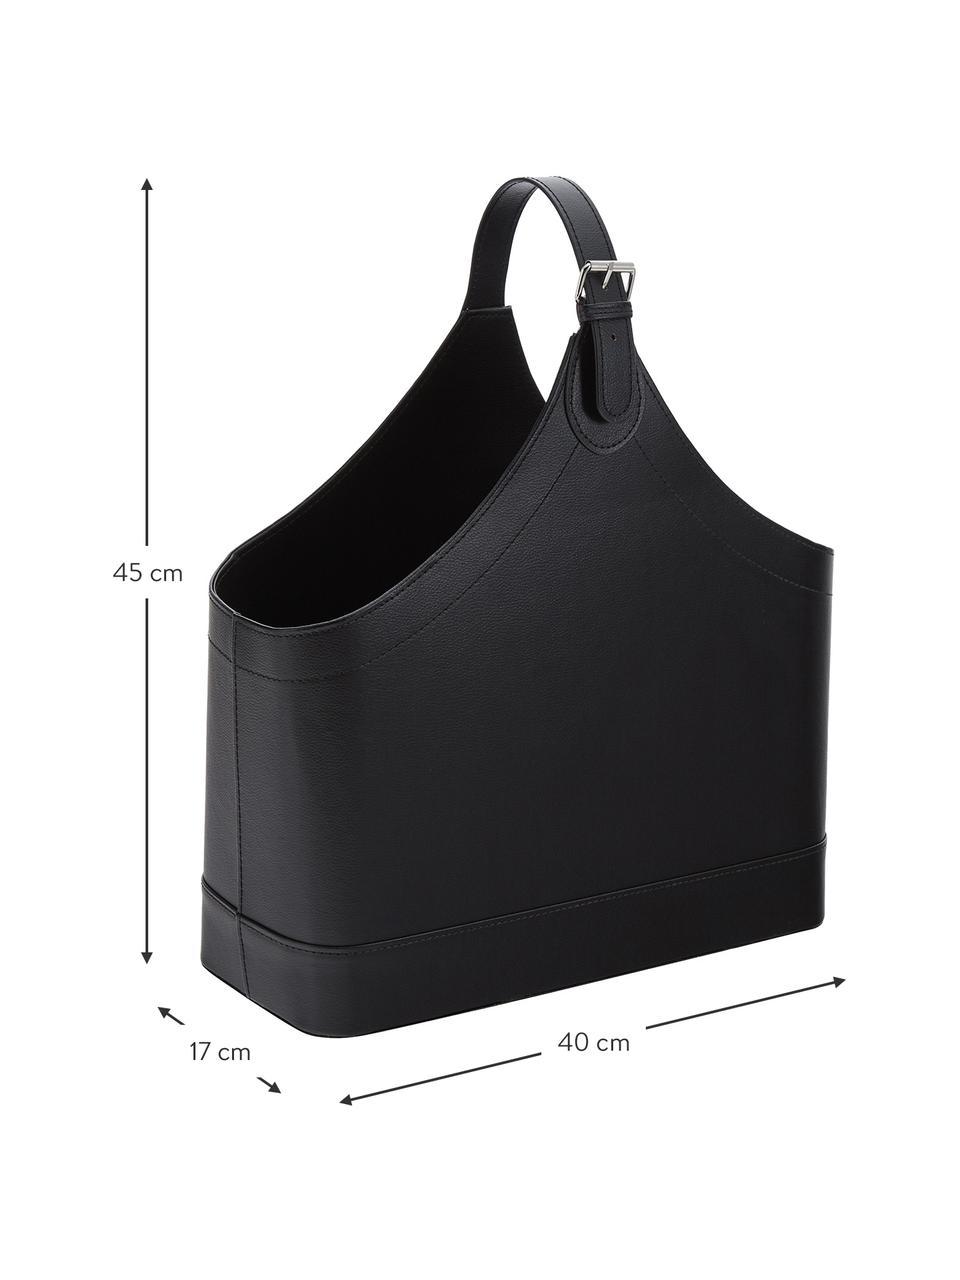 Zeitschriftenhalter Ready, Gestell: Karton, Bezug: Polyurethan, Verschluss: Metall, Zeitschriftenhalter: Schwarz Verschluss: Metall, 40 x 45 cm